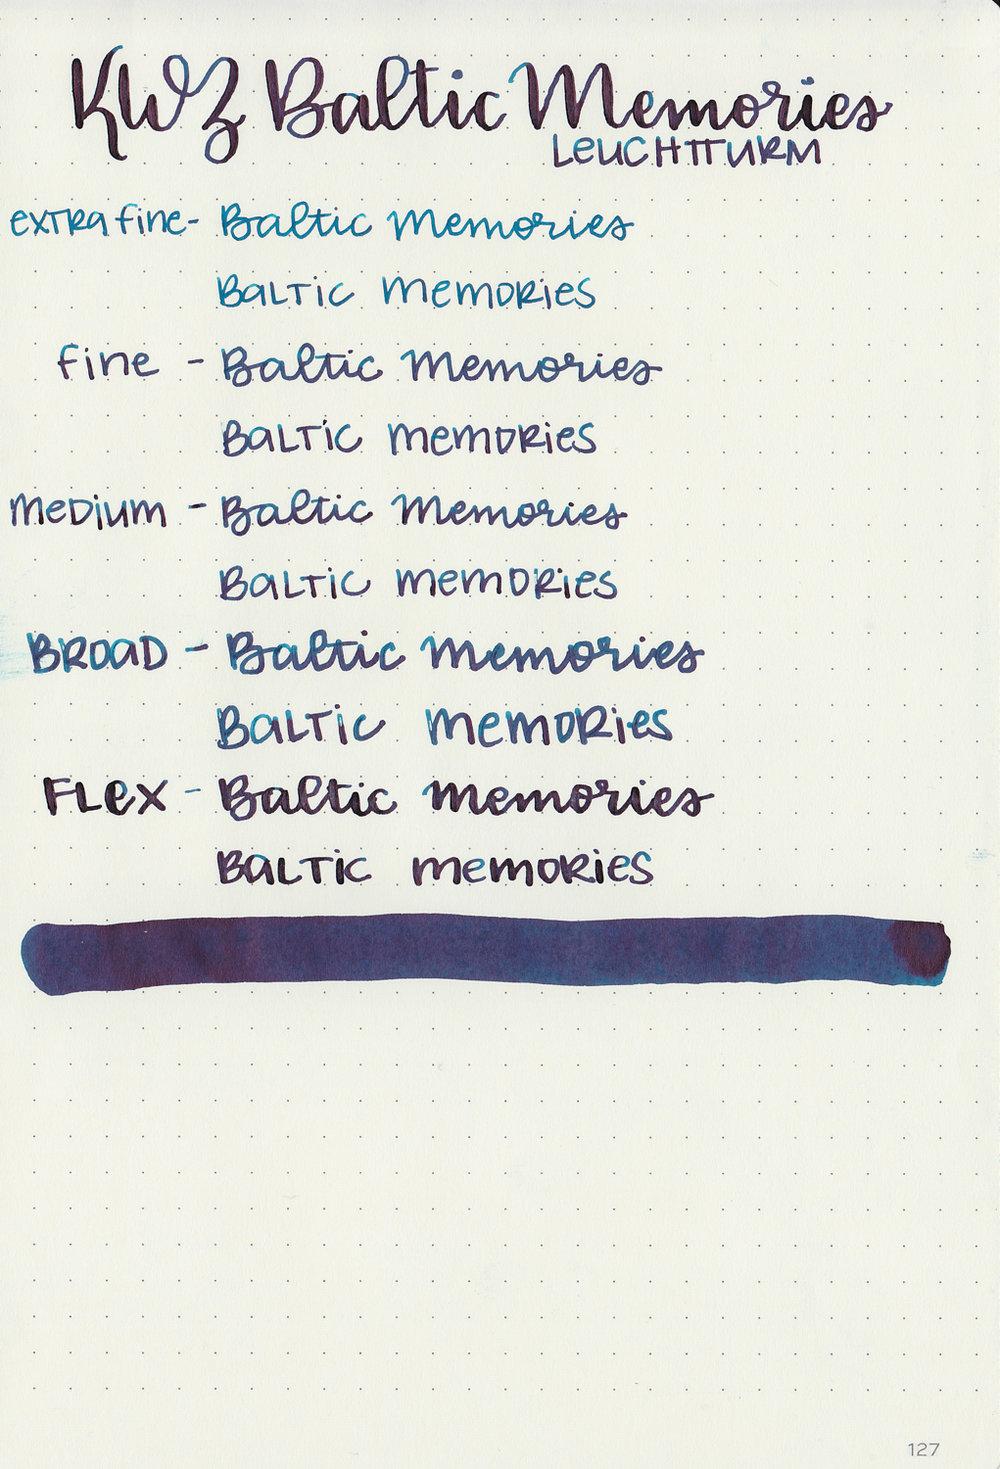 kwz-baltic-memories-7.jpg